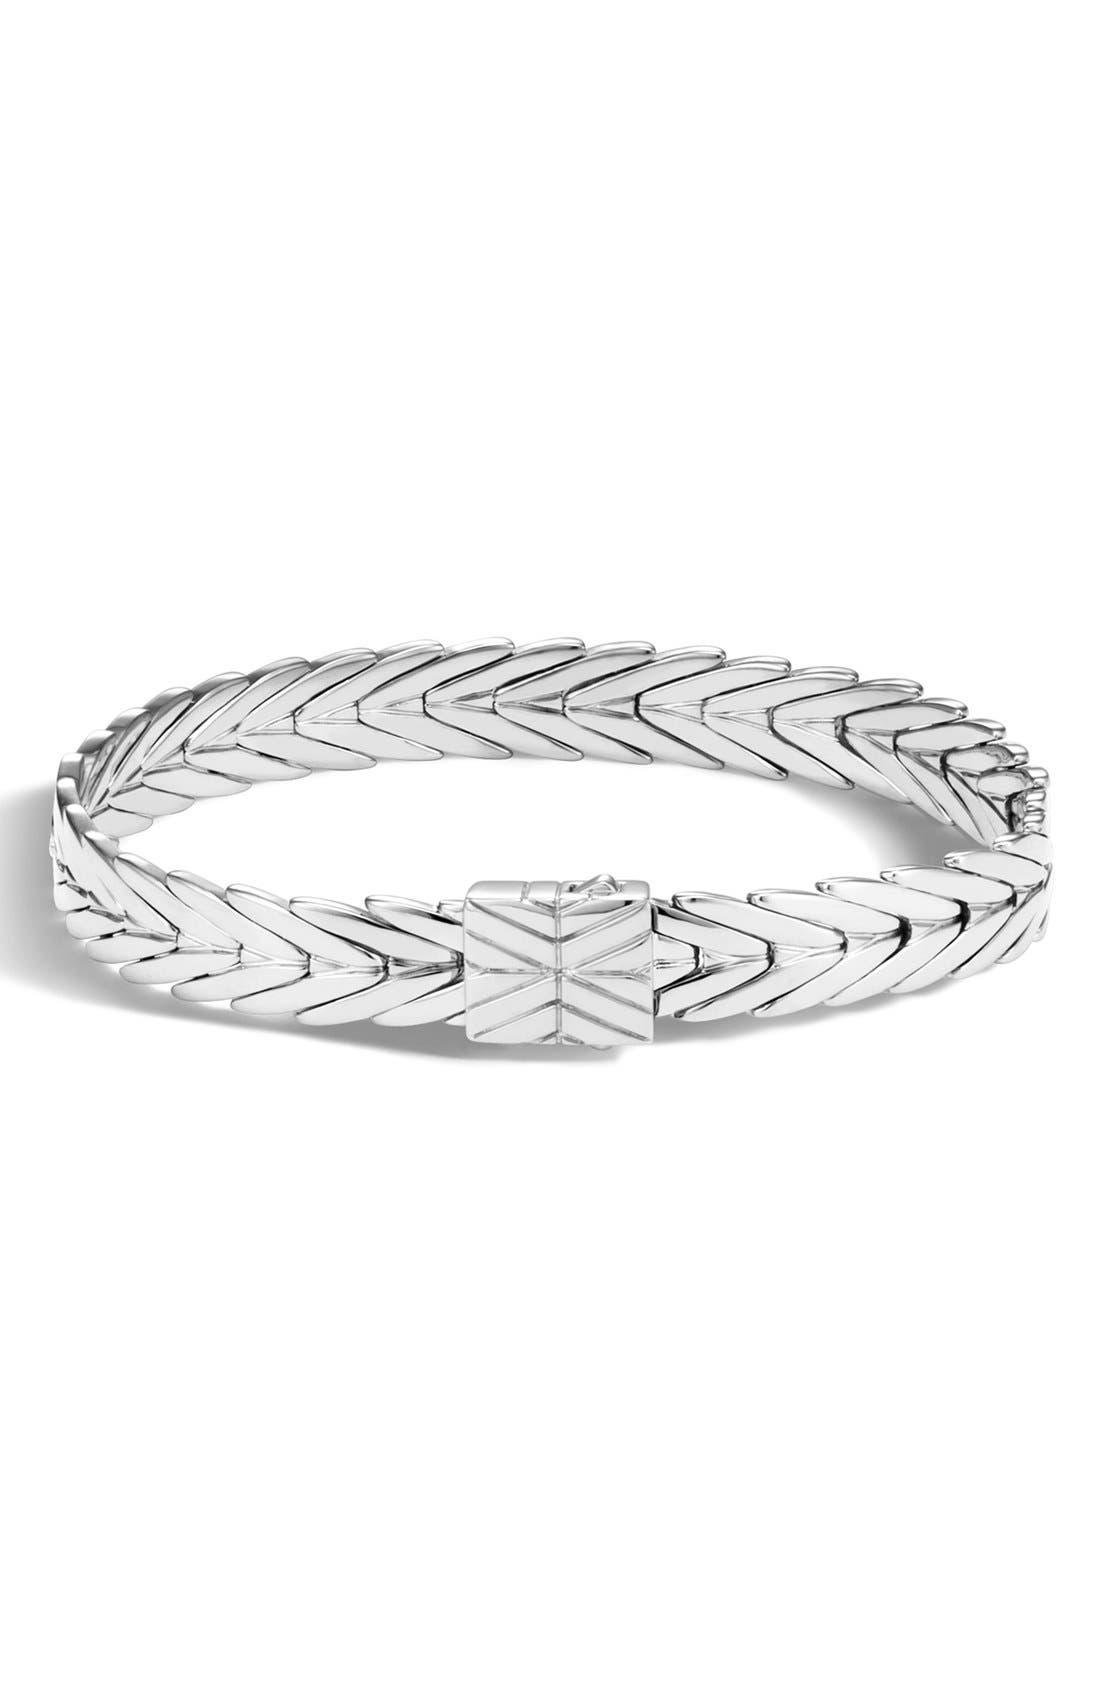 John Hardy Modern Chain Silver 13mm Rectangular Bracelet with Diamond Clasp, Size M